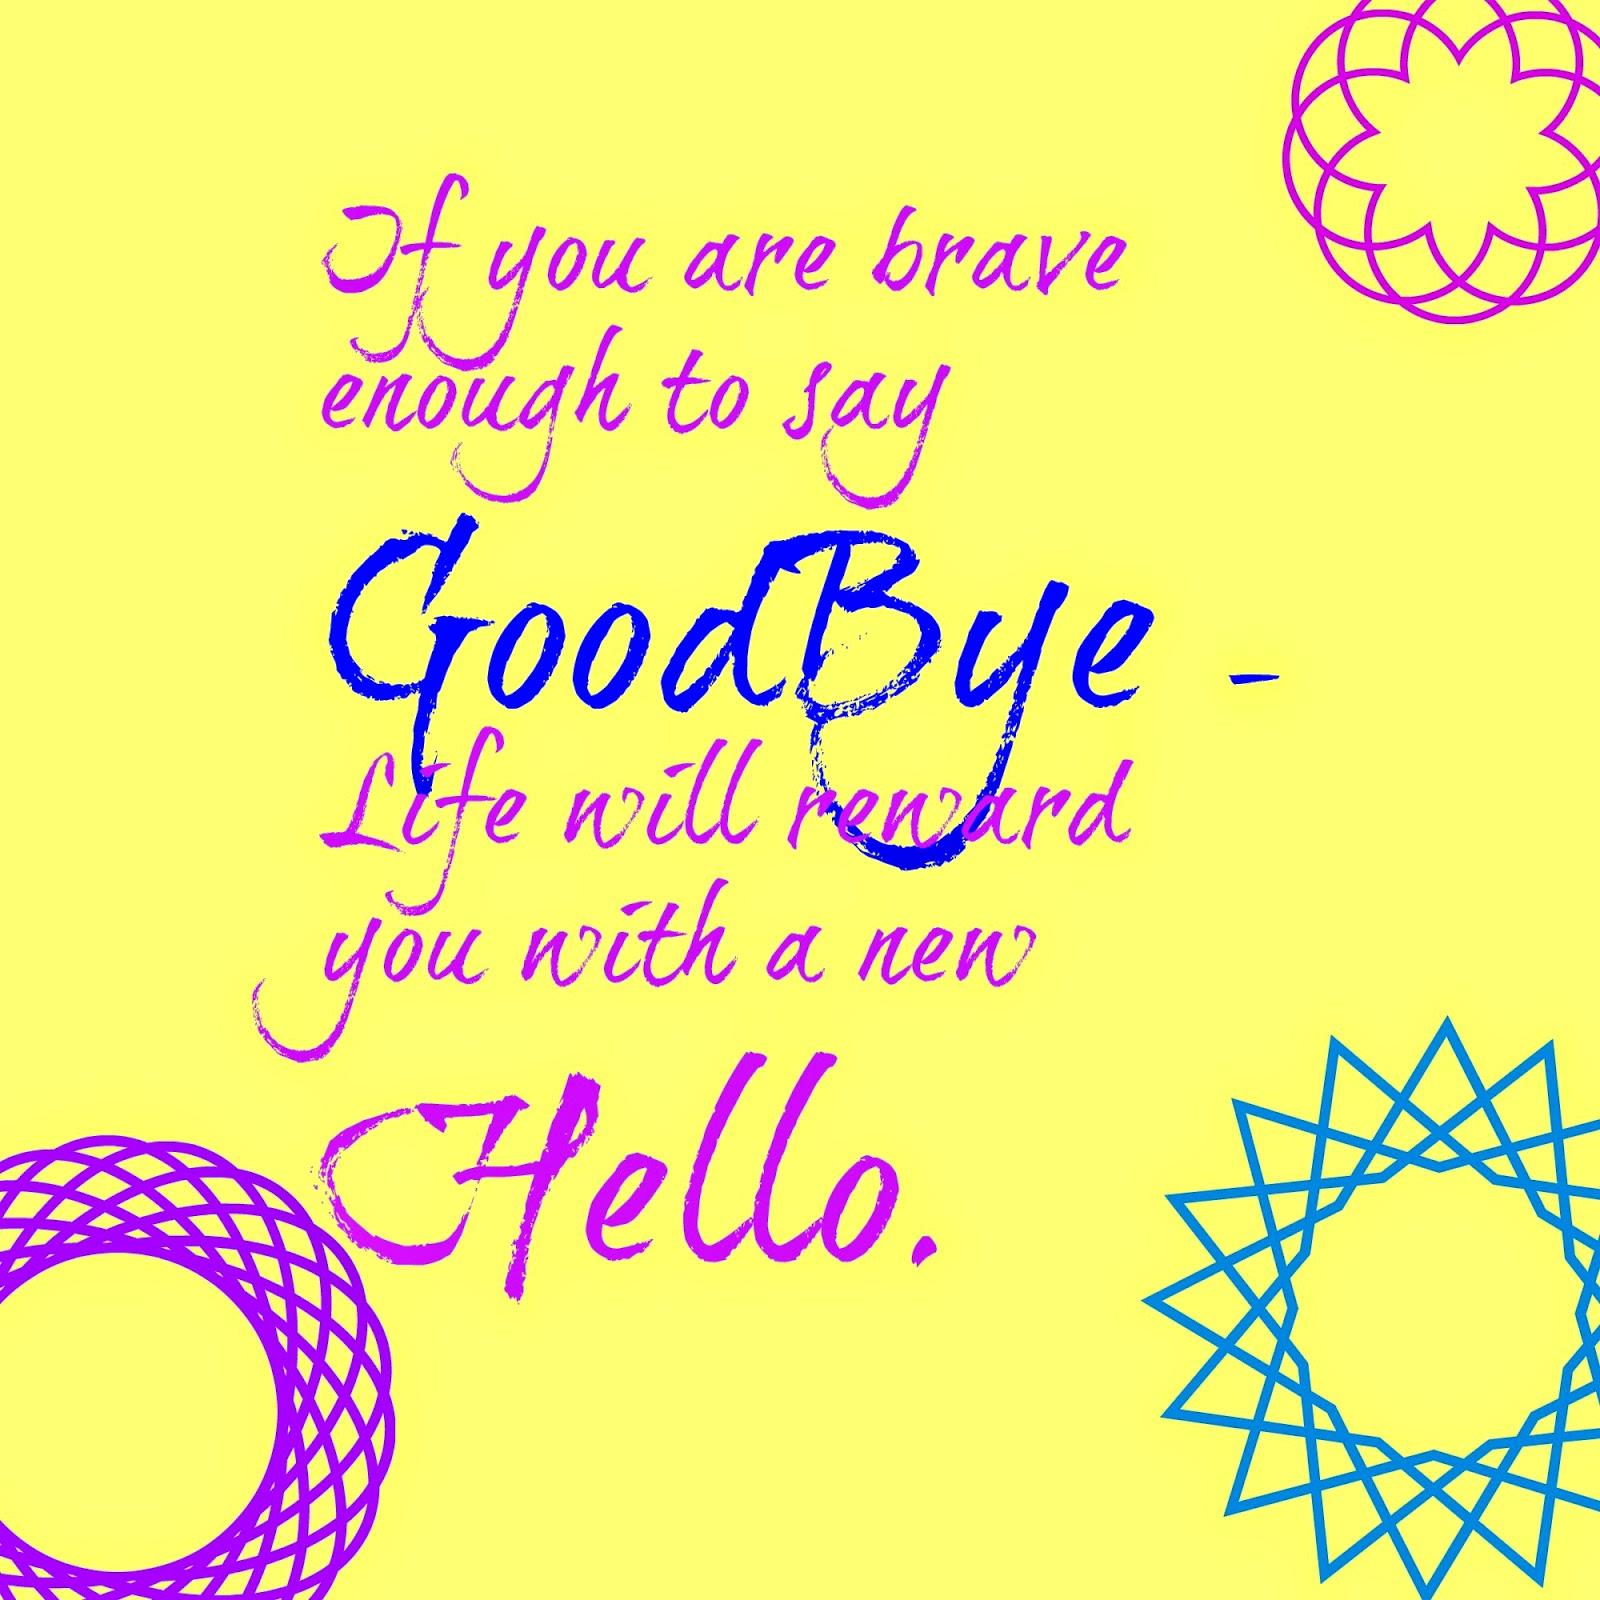 http://3.bp.blogspot.com/-3nYw-18IBYg/VNO7f35iXJI/AAAAAAAAWaI/ZXSsLeTTCcw/s1600/goodbye.jpg